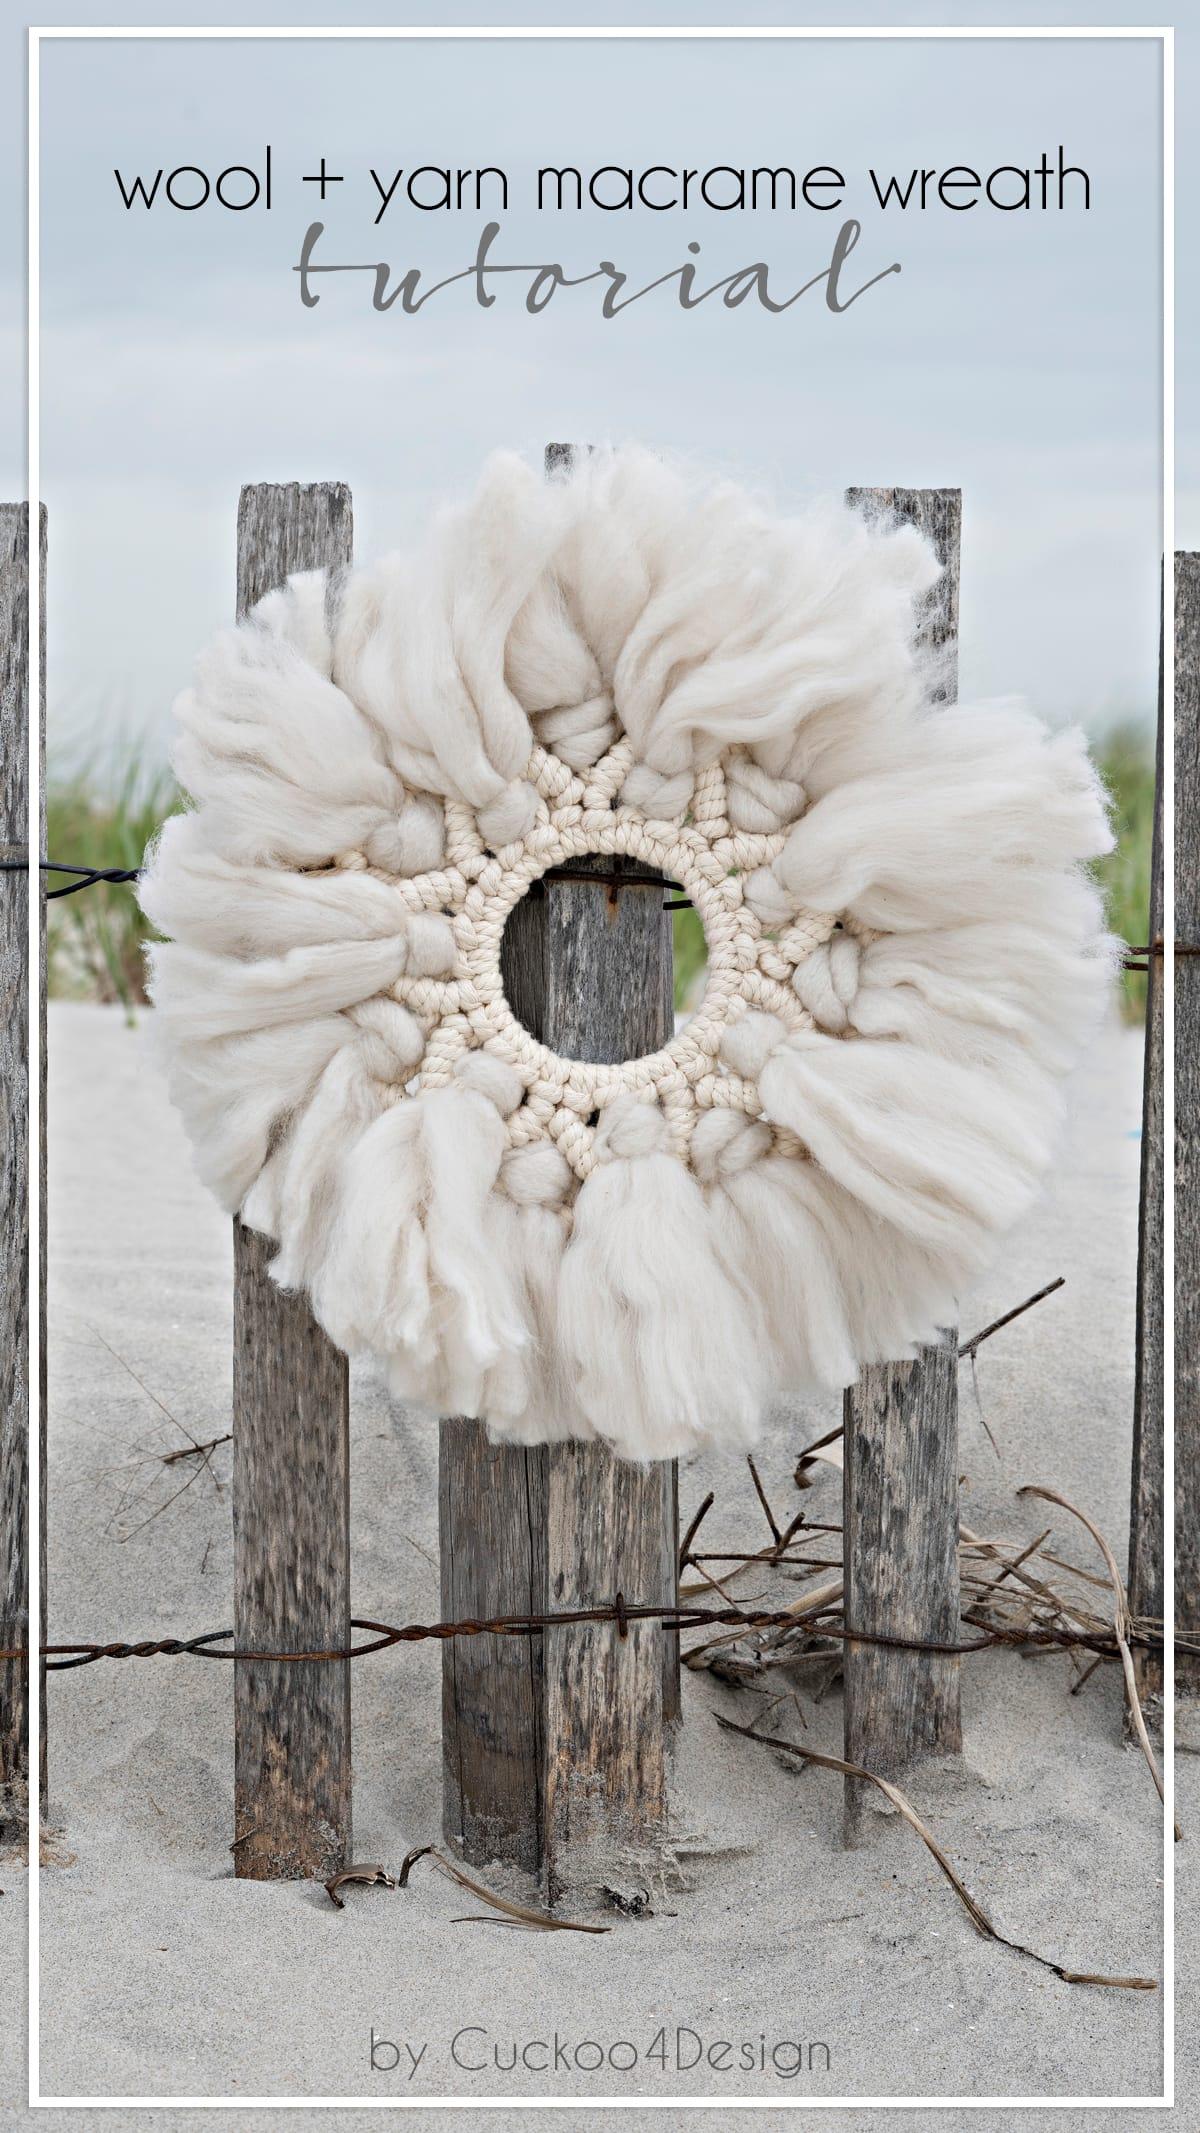 DIY wool and yarn macrame wreath tutorial